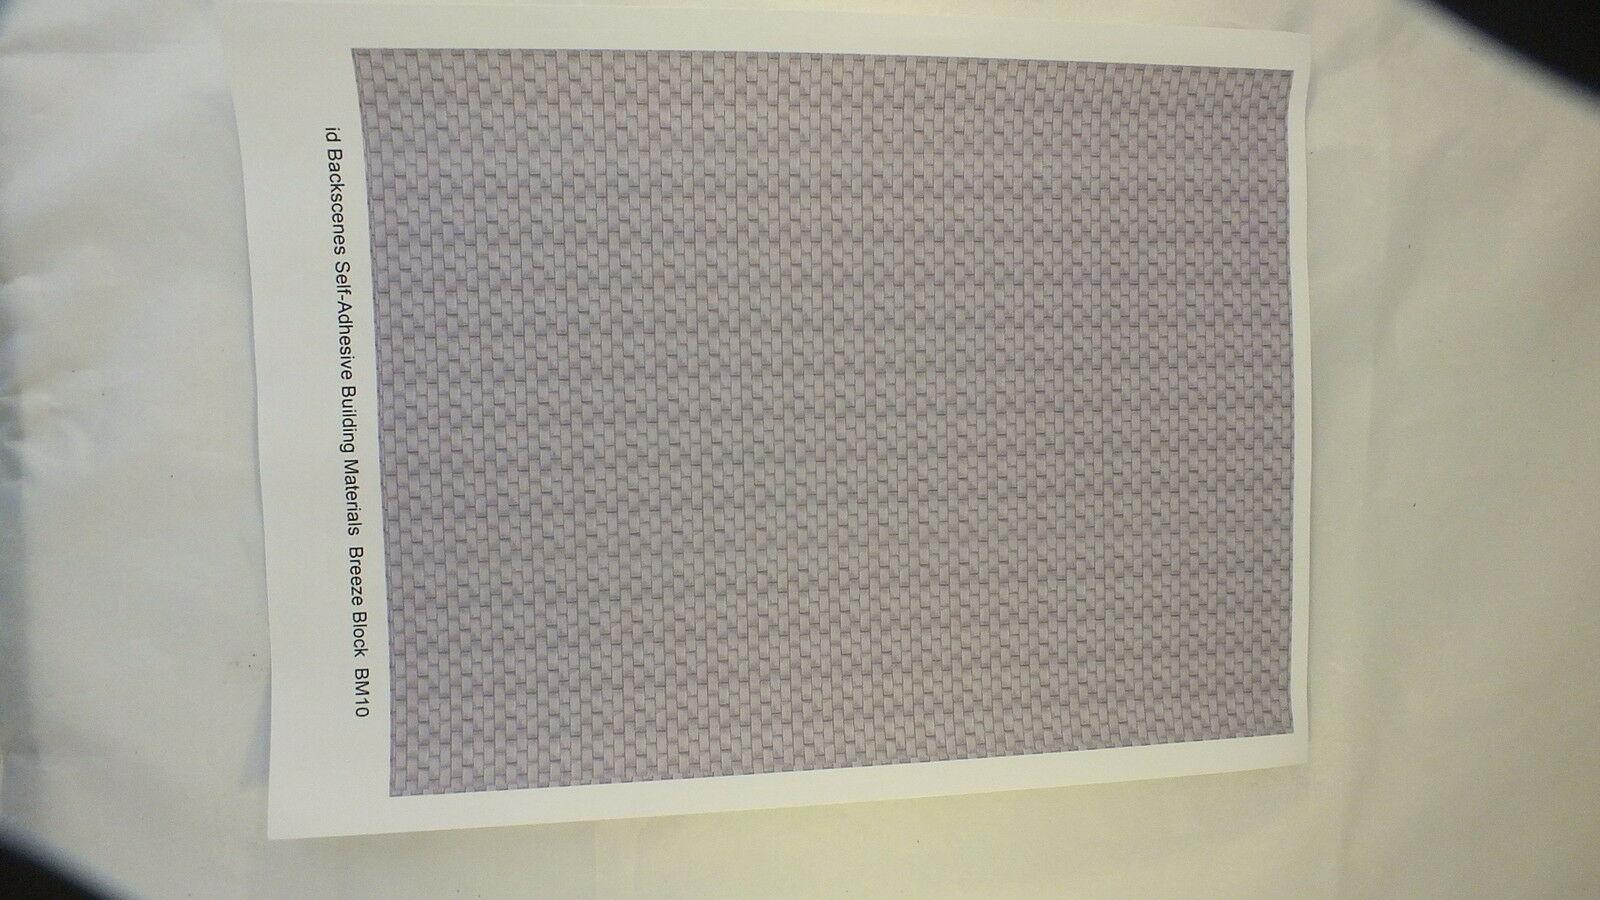 BM10 # JAVIS BREEZE BLOCK WALL SELF ADHESIVE SINGLE A4 SHEET   S2D